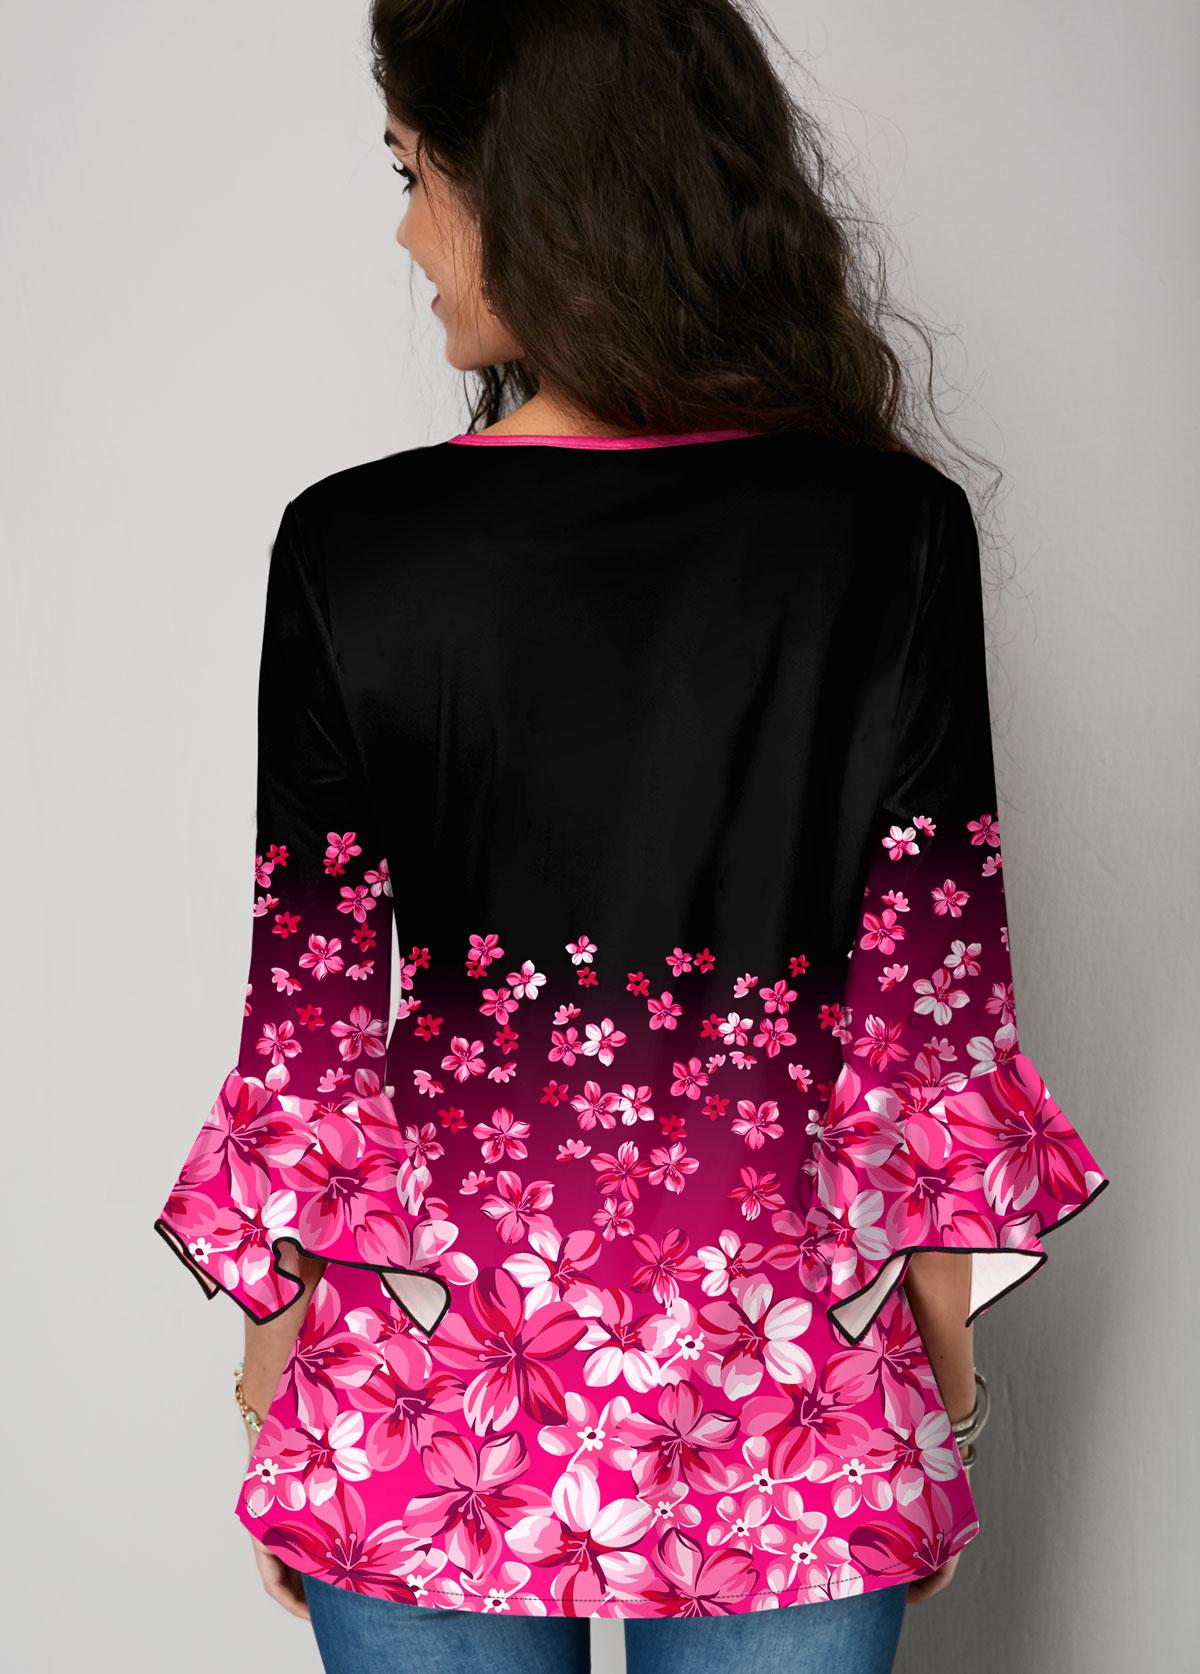 Gradient Floral Print Hanky Cuff Blouse